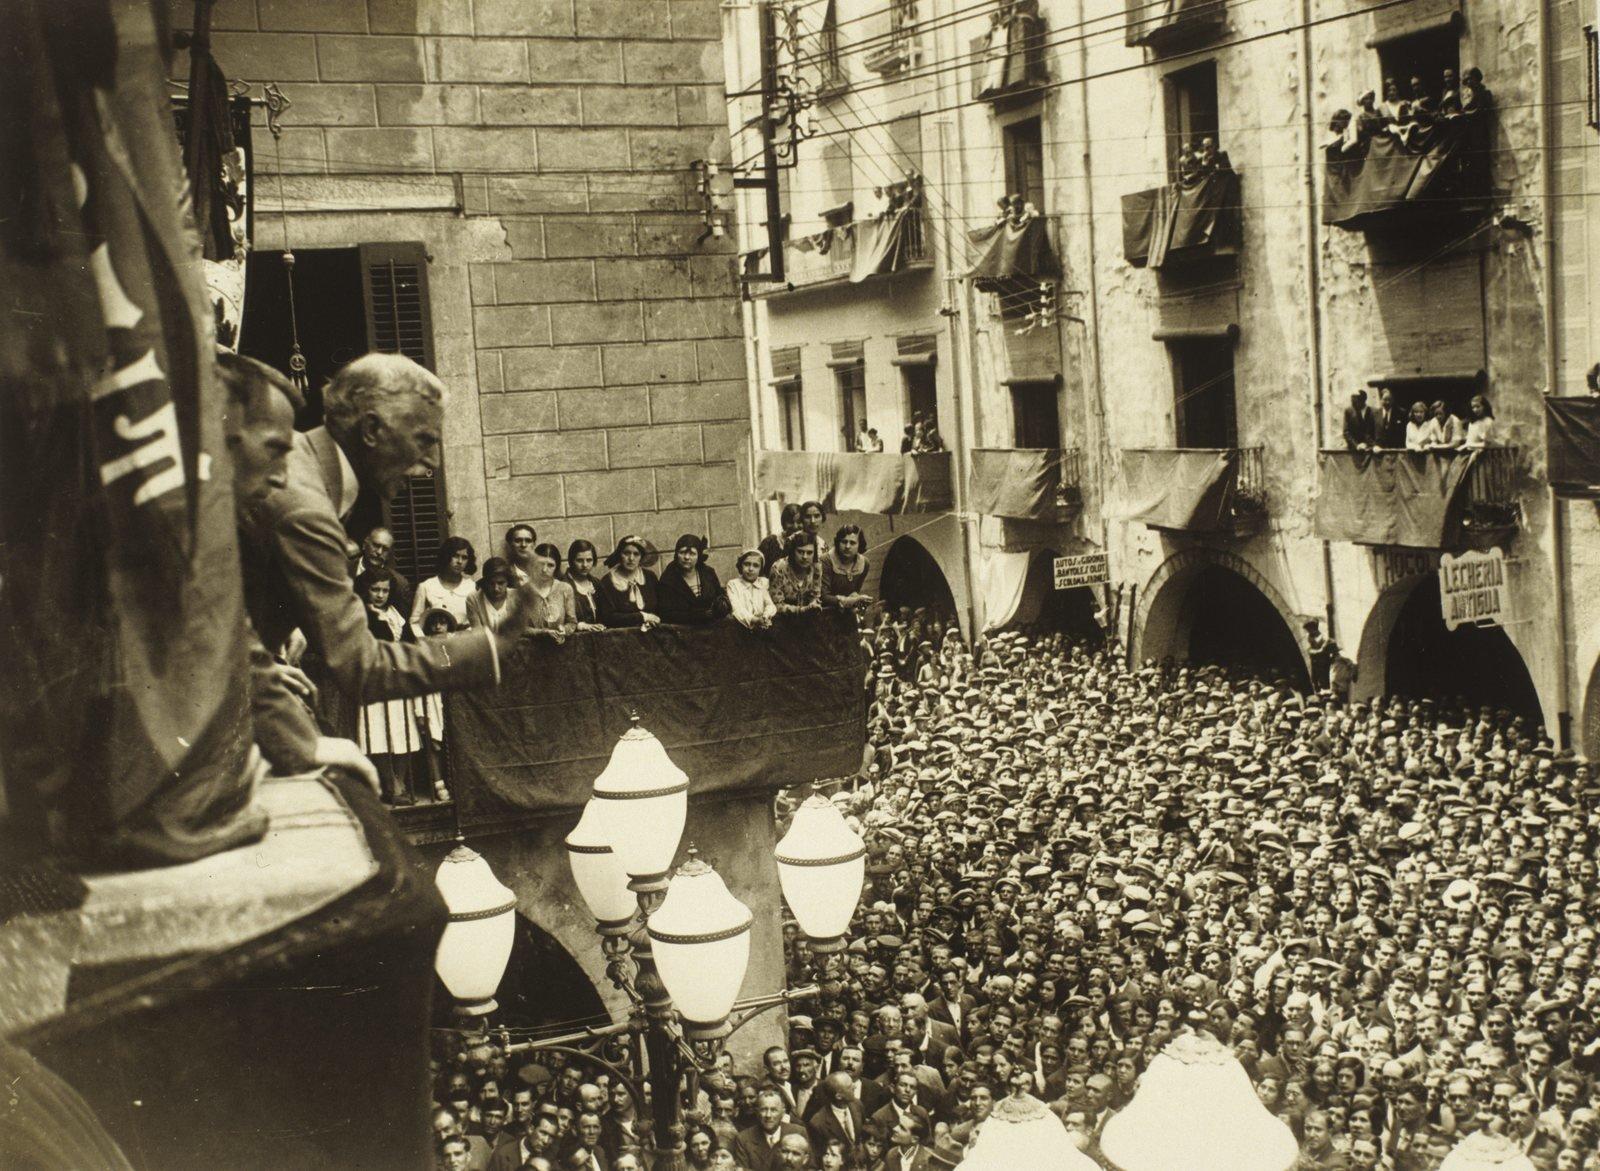 Francesc Macià on the balcony of Ajuntament de Girona, 1931, Josep Maria Sagarra, Ajuntament de Girona/CRDI, In Copyright